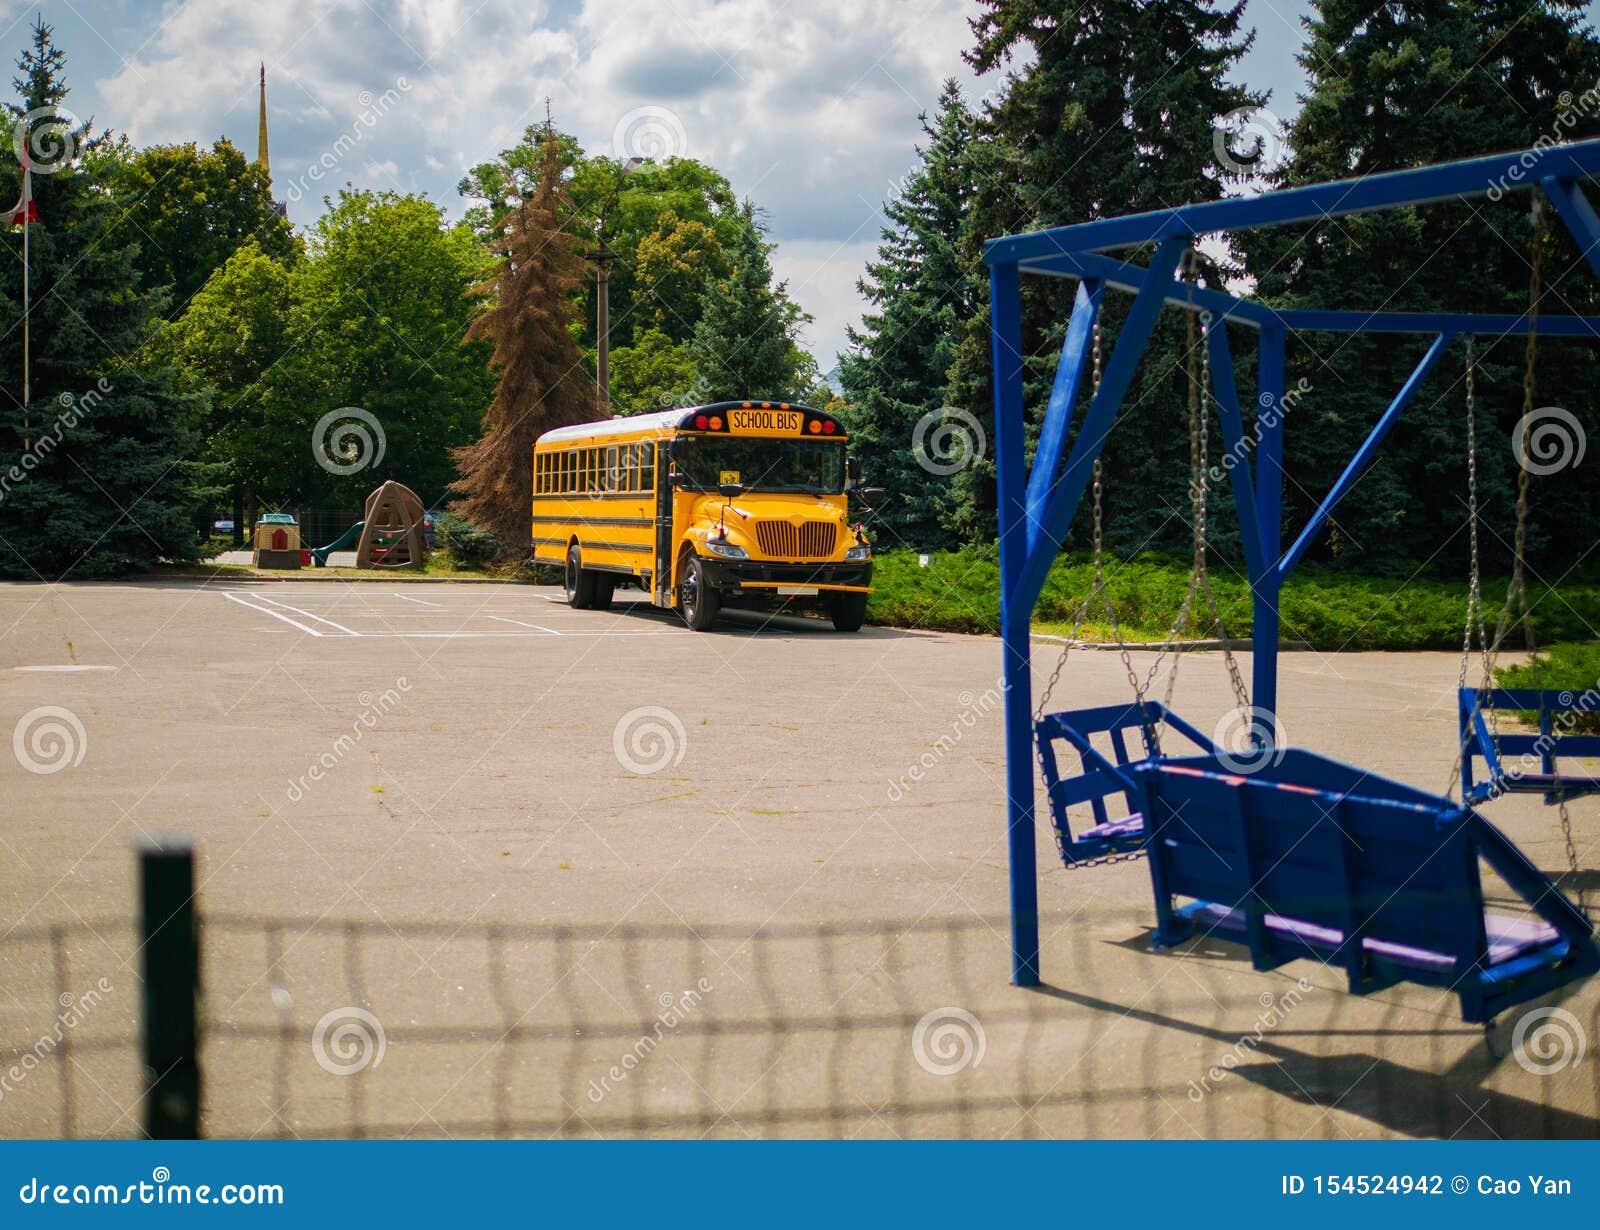 School bus parked by the school in Ukraine.